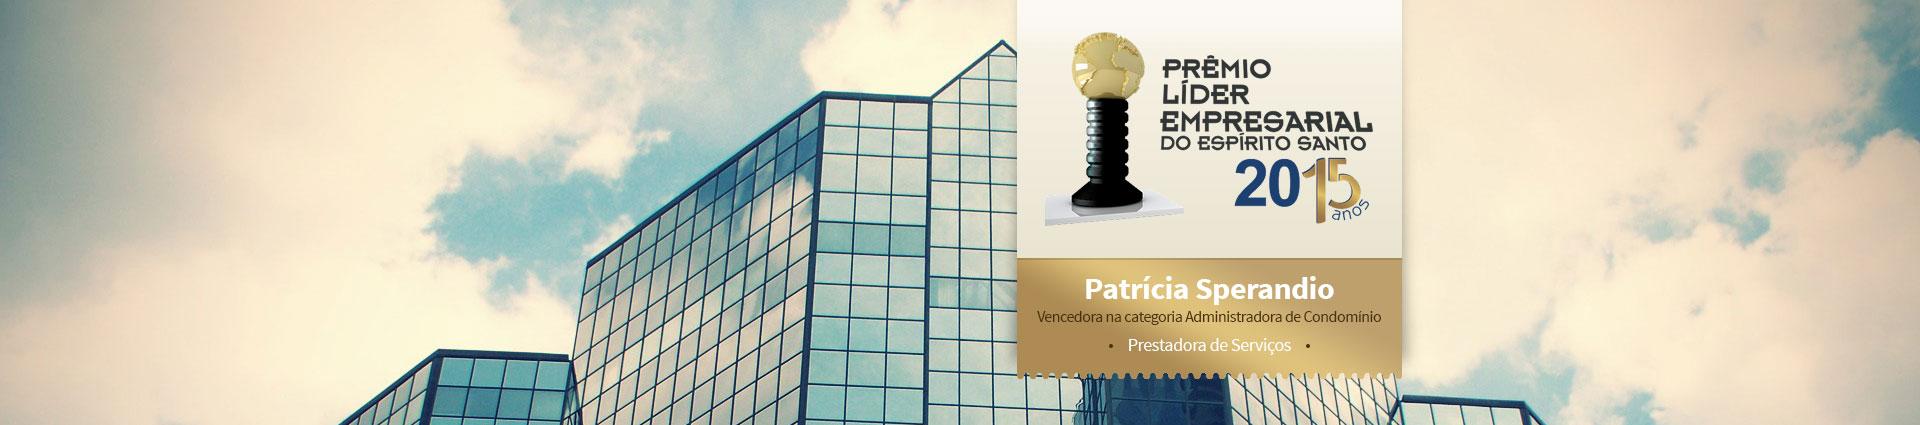 Apresentacao_banner_site_premio